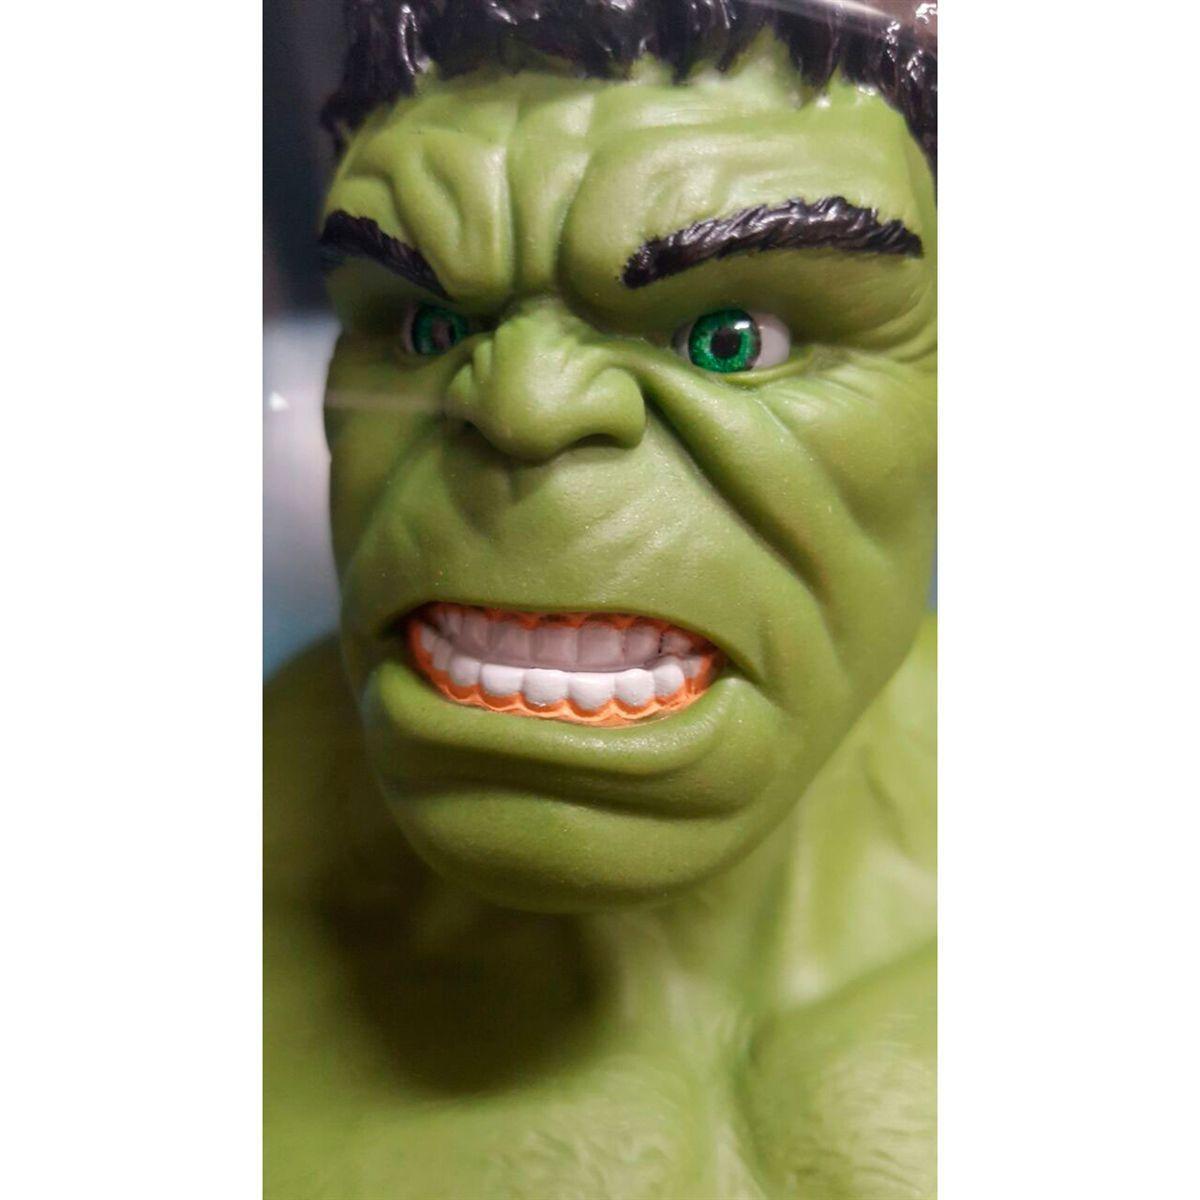 Boneco Hulk Verde - Avengers - Mimo - Bonecos - Magazine Luiza 15c9bfeba7a